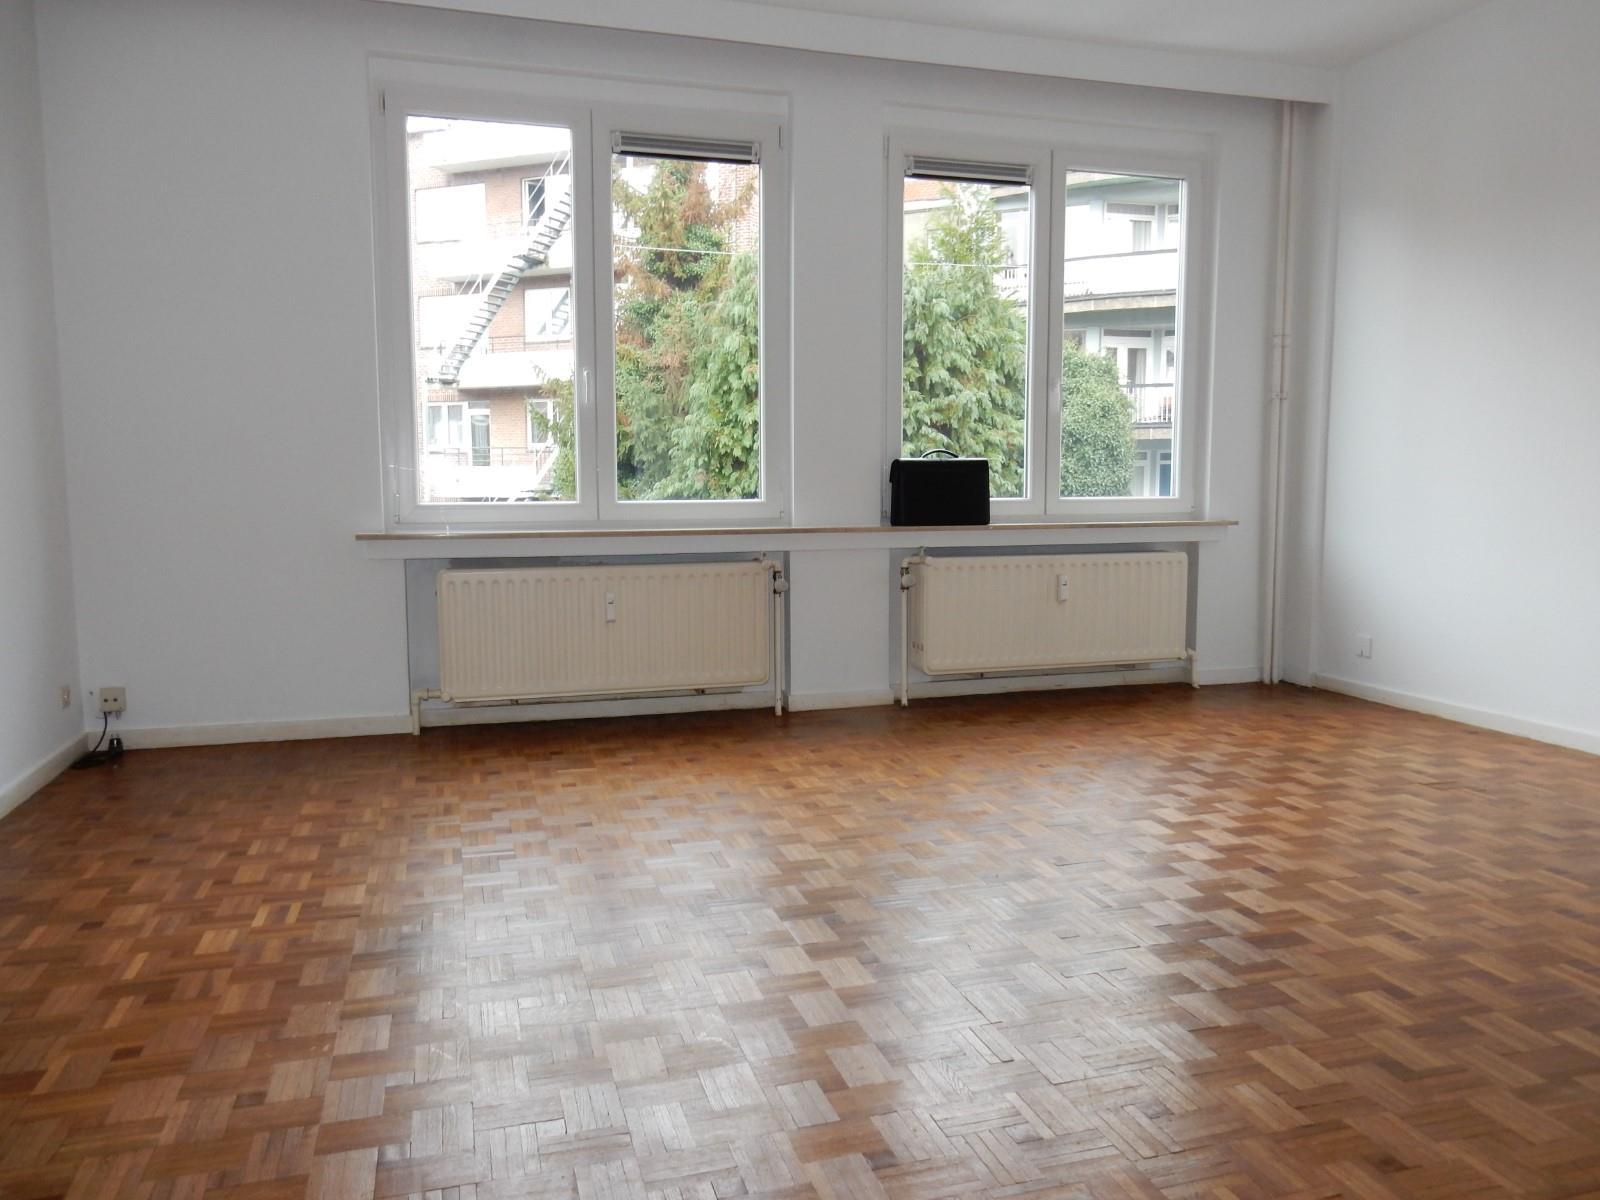 Appartement - Woluwe-Saint-Lambert - #3033017-1